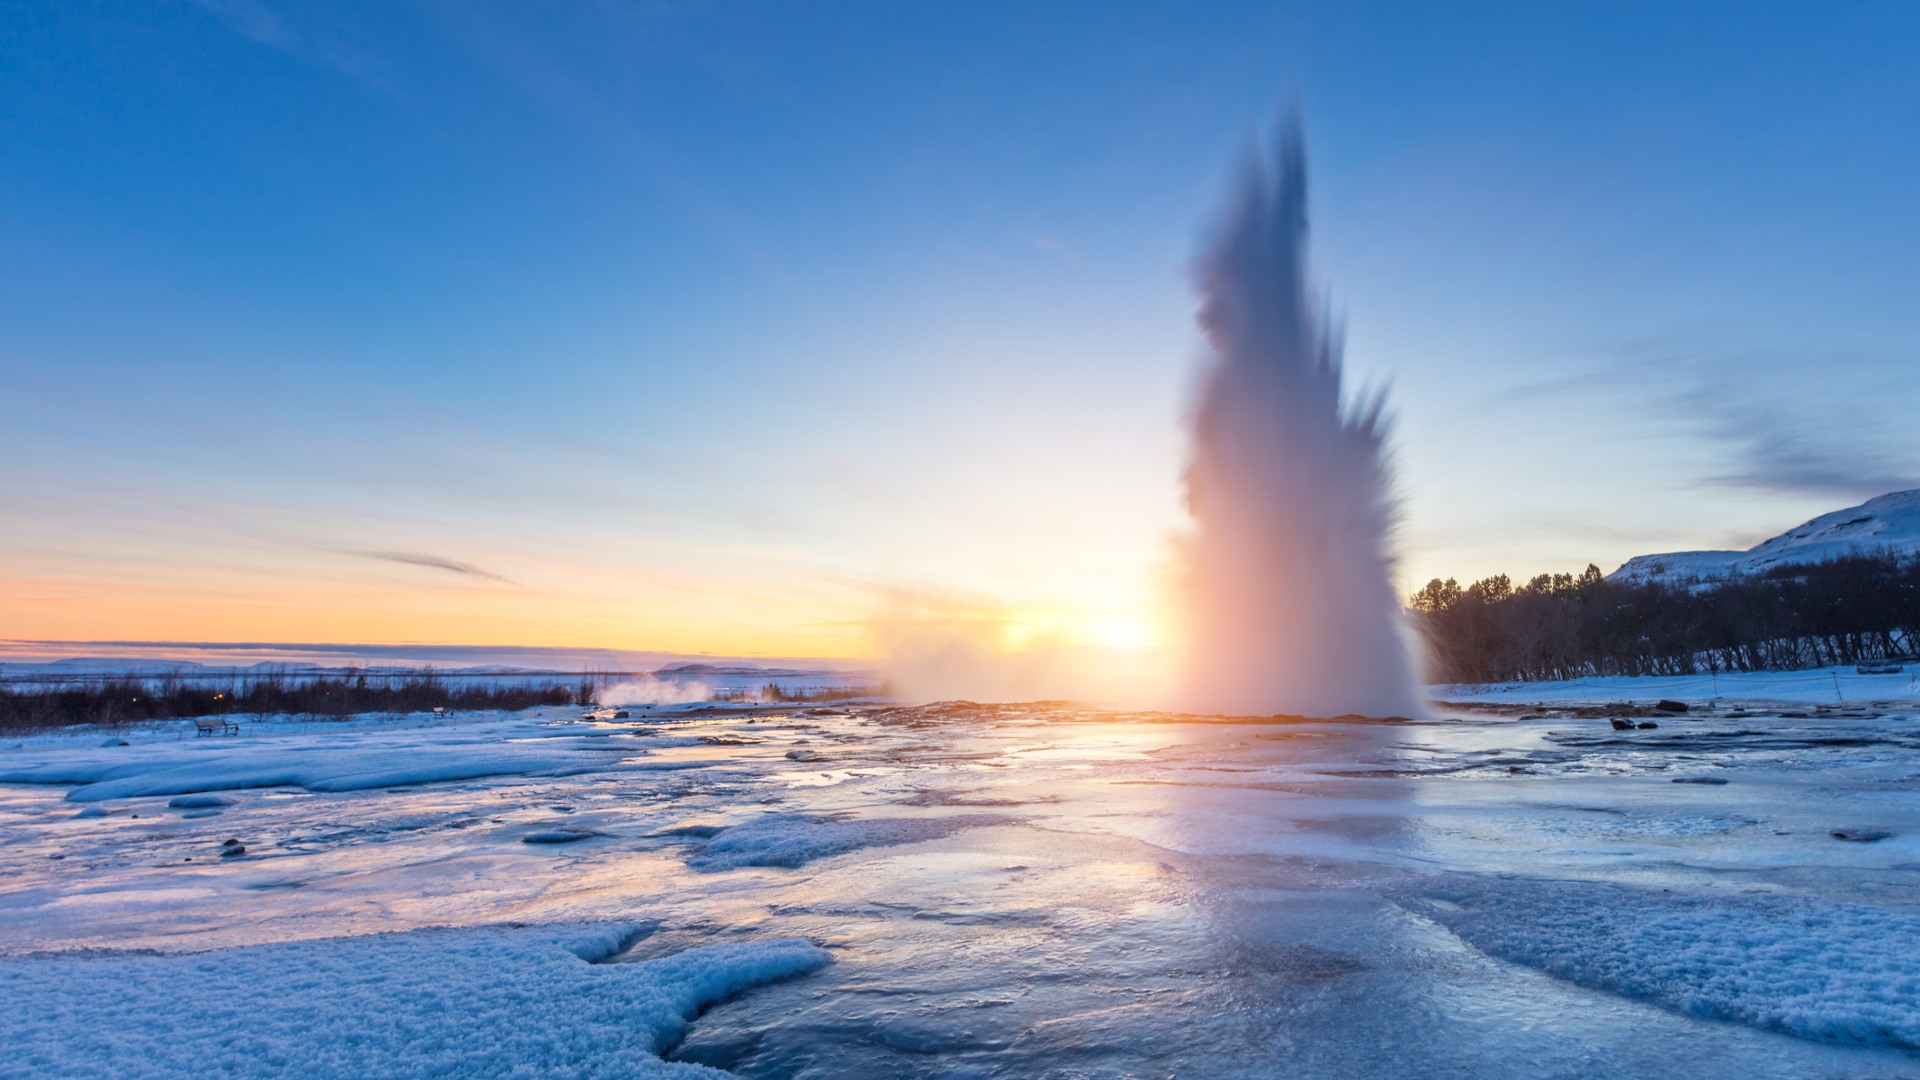 The Strokkur geyser erupting, surrounded by frozen ice.